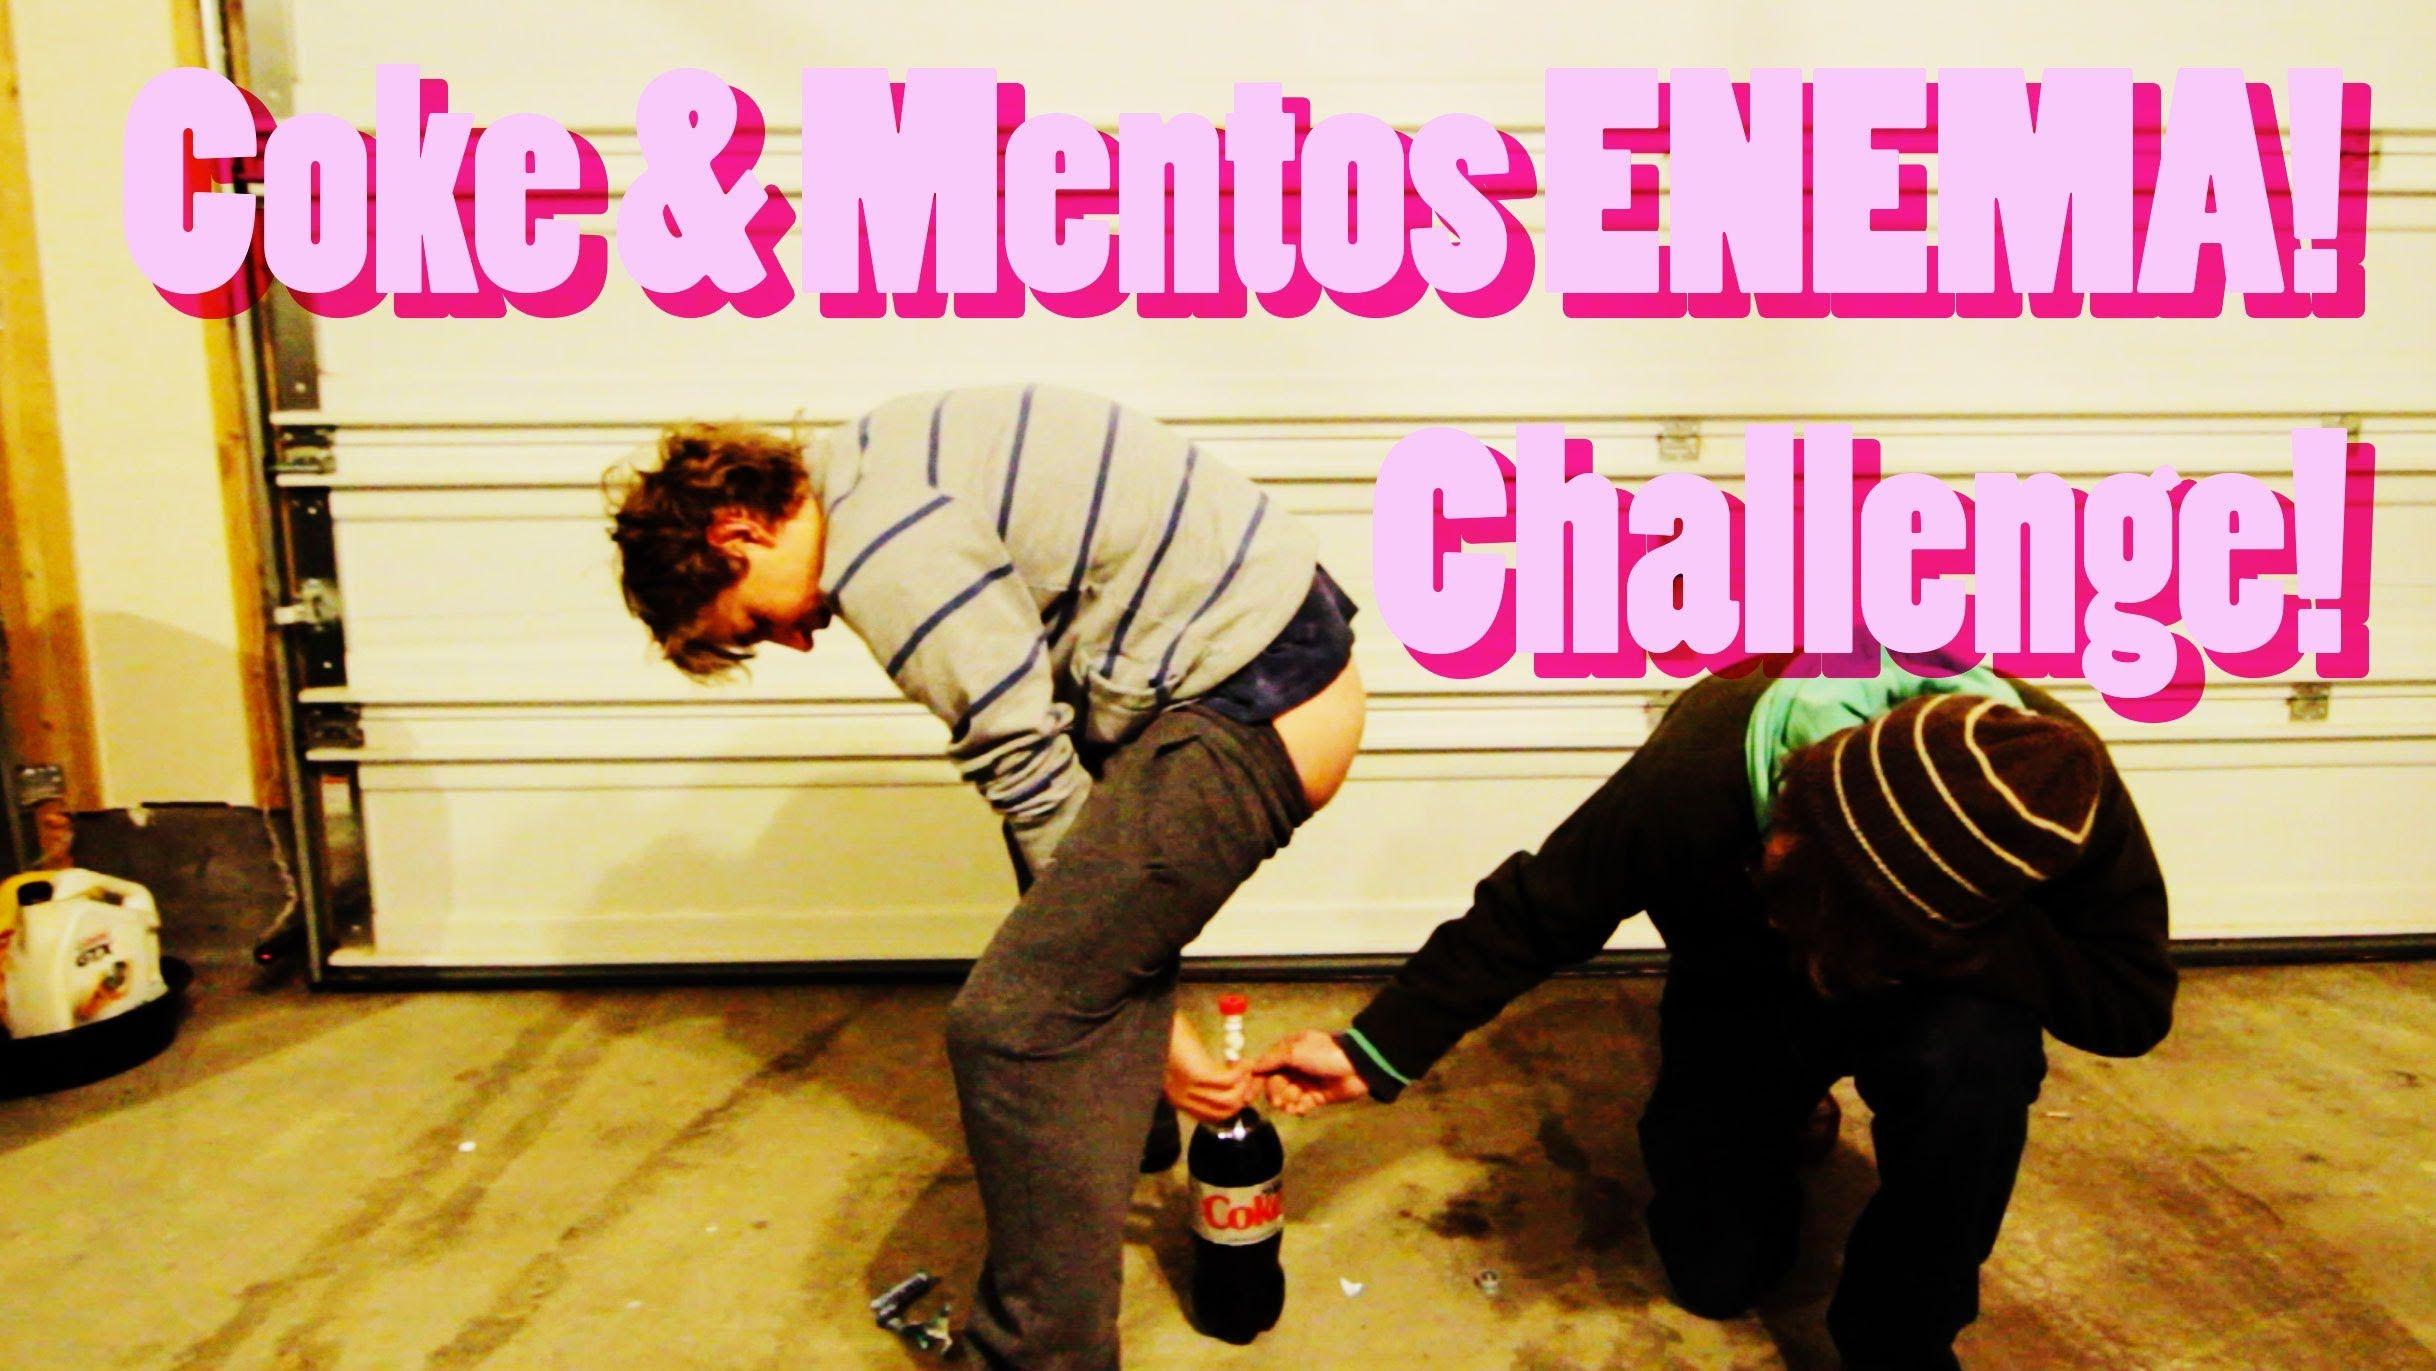 Diet Coke and Mentos Enema Challenge